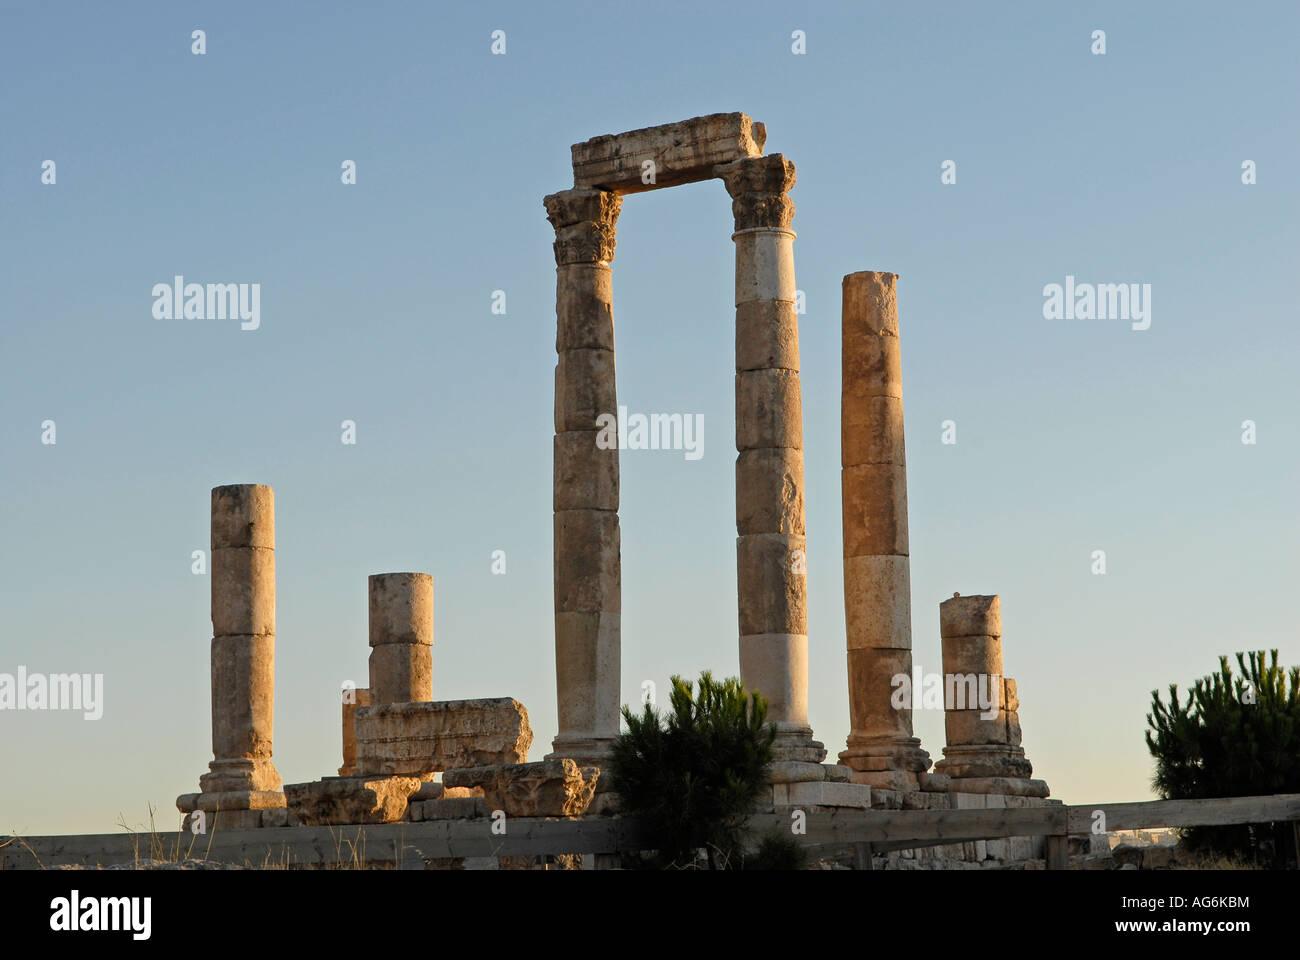 Ruins of the Citadel. Jebel al-Qalaa, Qala hill, columns of the roman Hercules temple in Amman Jordan Stock Photo